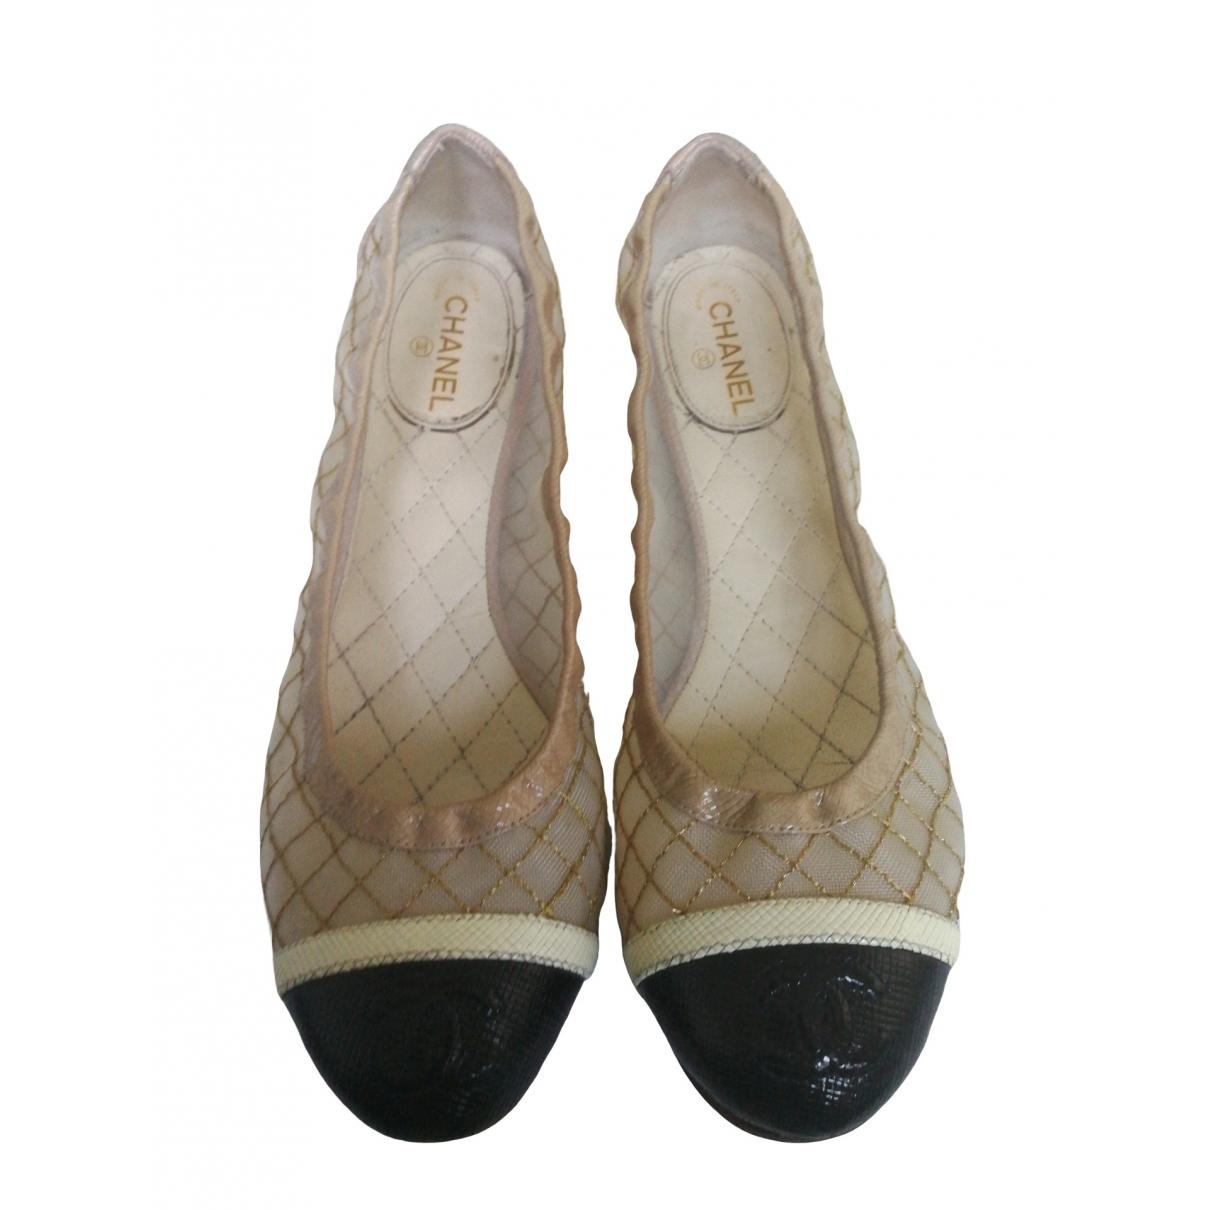 Chanel \N Ballerinas in  Beige Lackleder